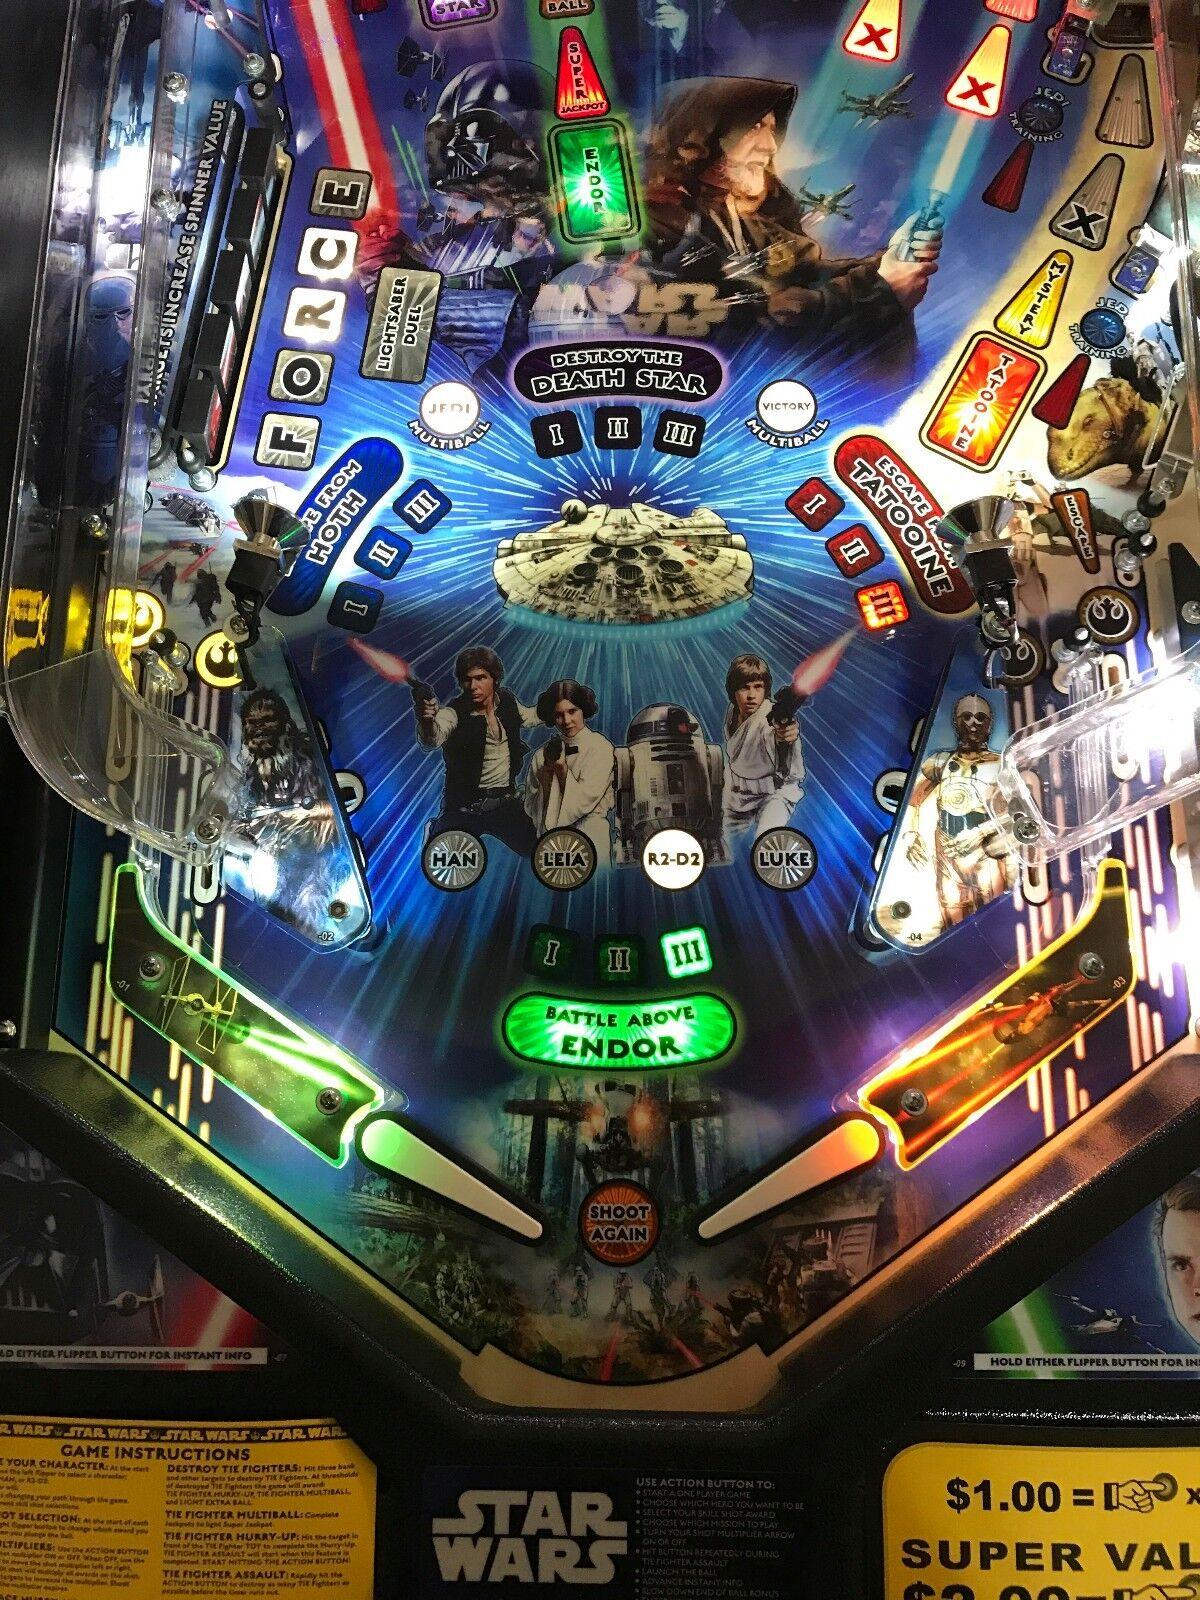 Slingshot & Return Lane Protector Set for Stern's Star Wars pinball machine